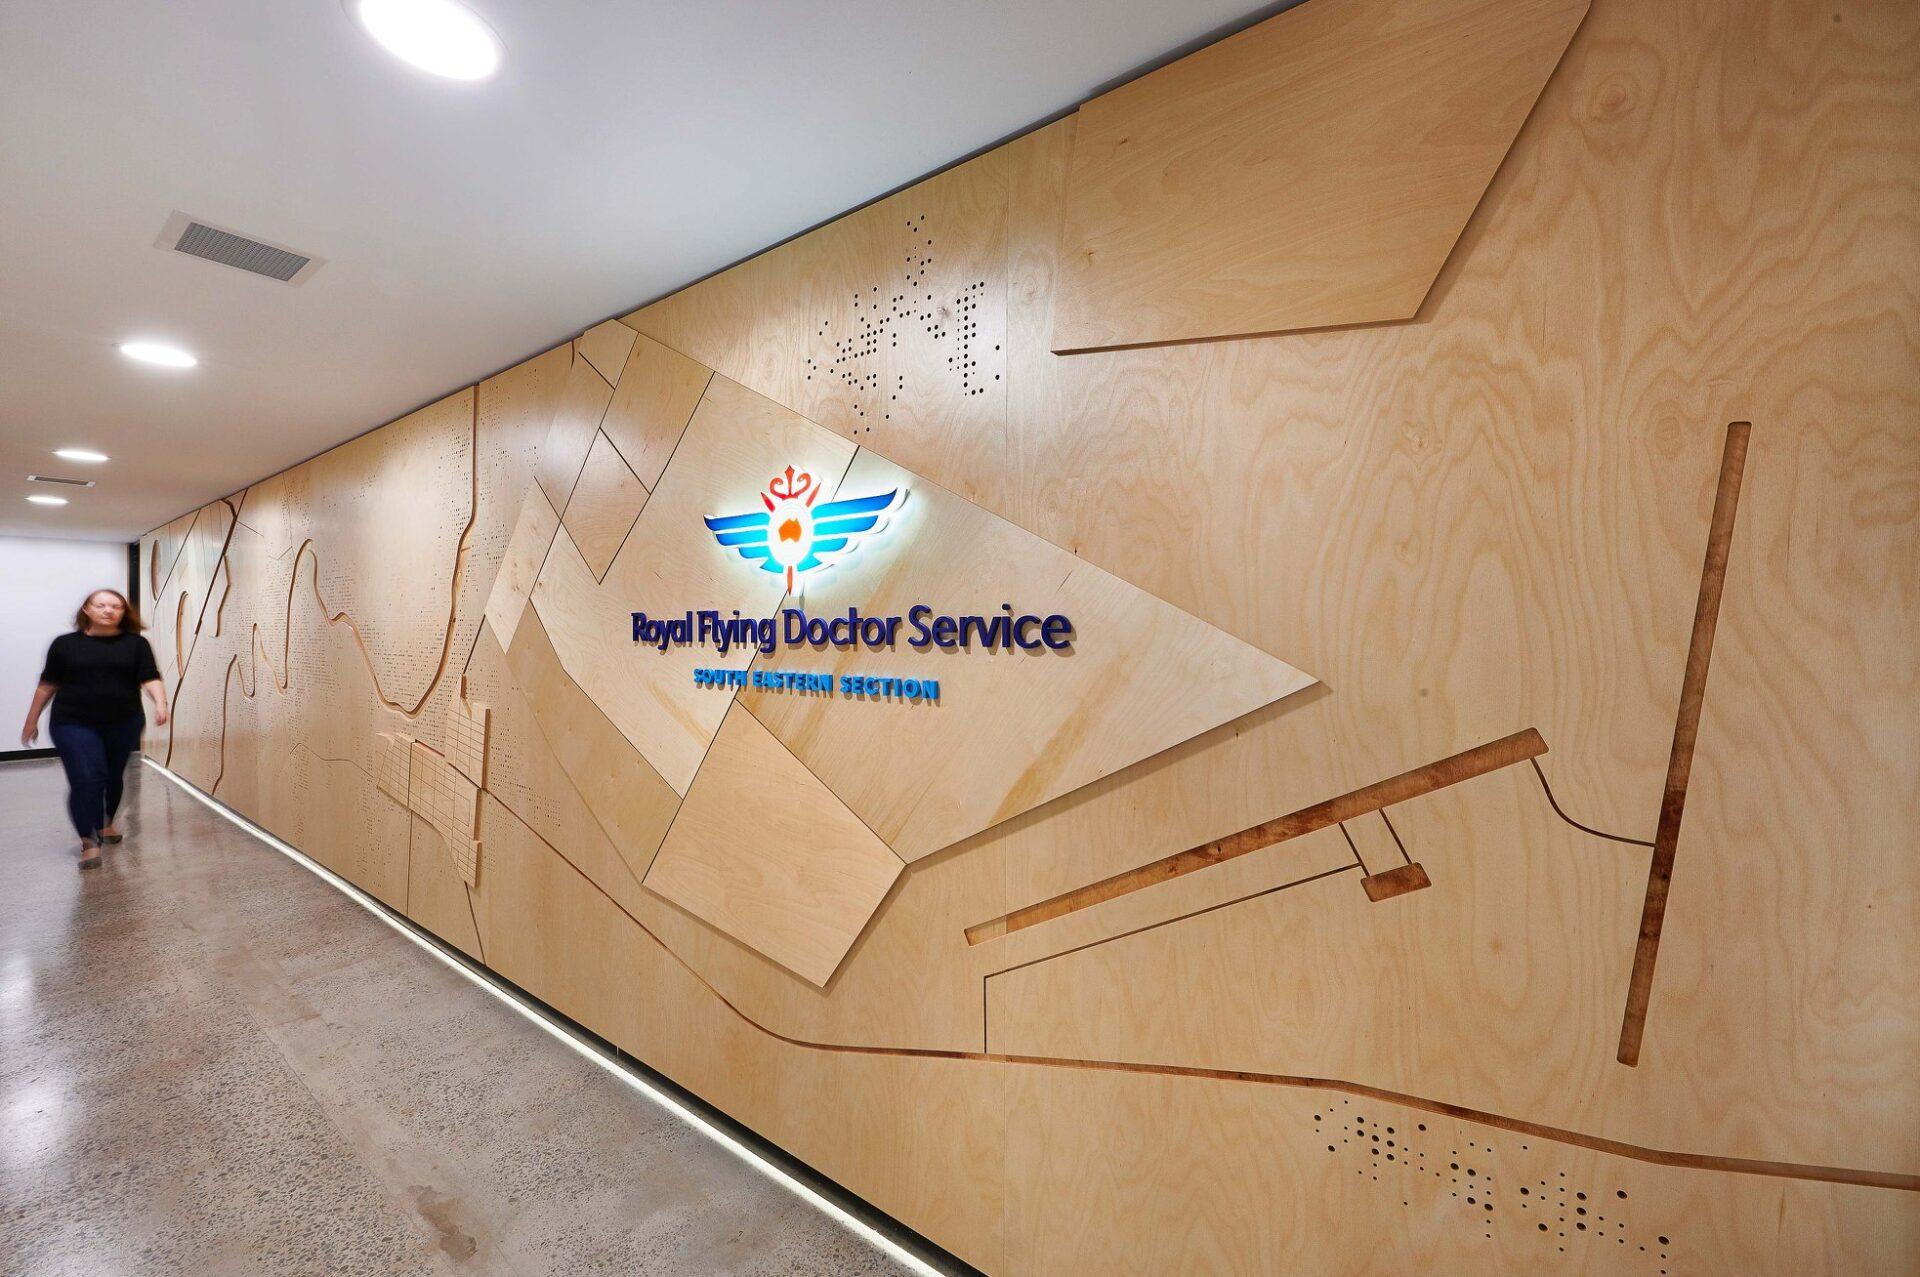 Royal Flying Doctors Keystone Linings